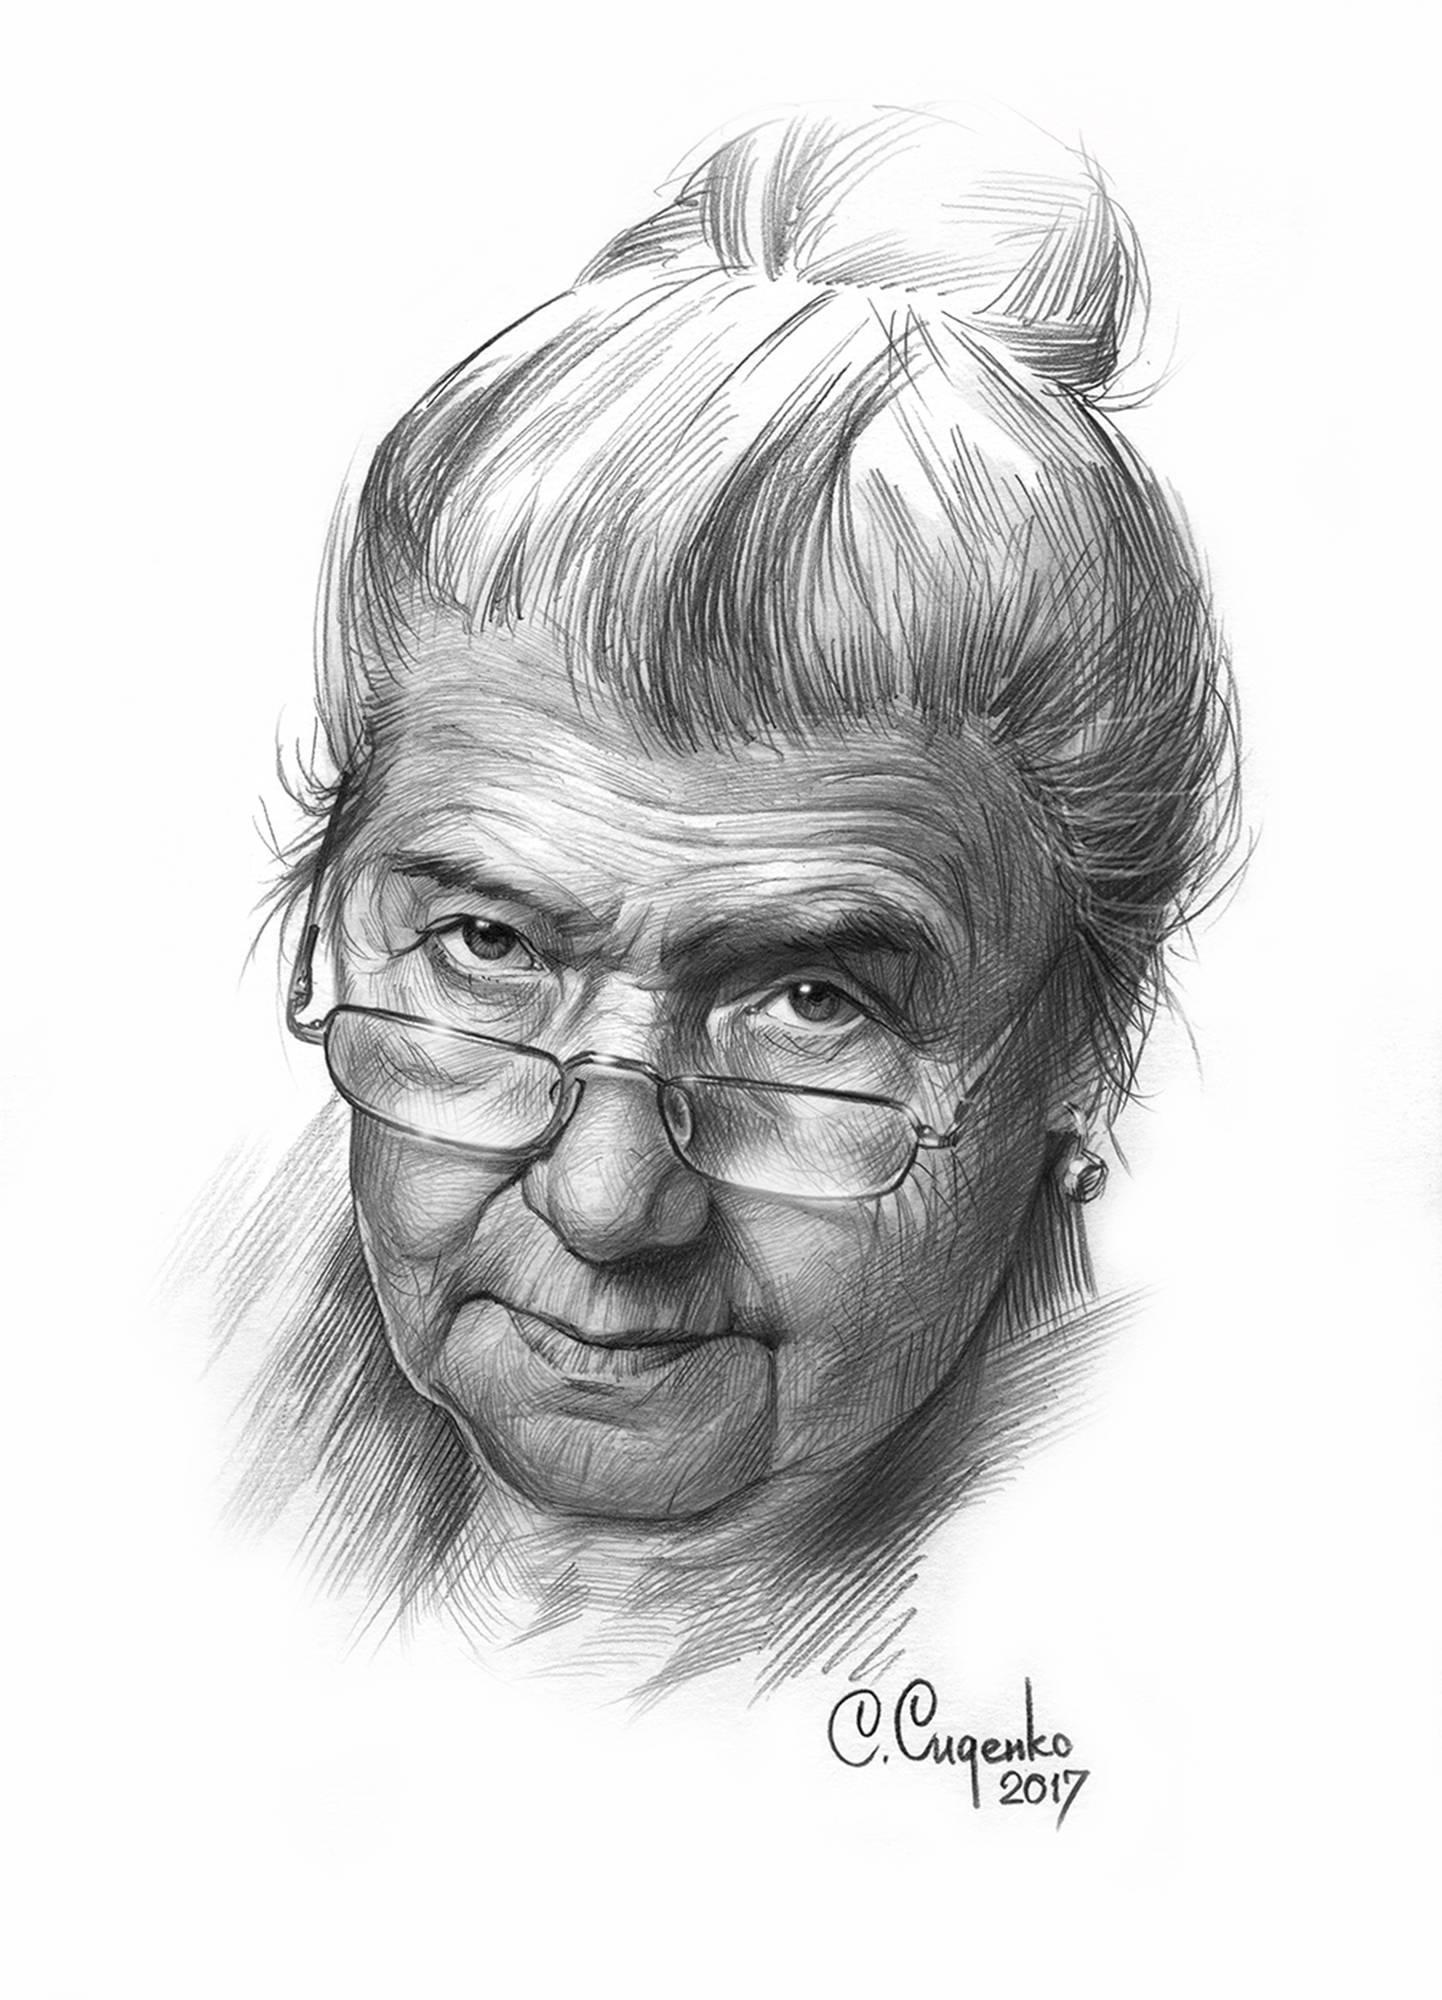 """Женский портрет"" (бумага/карандаш) 20х30см, 2017 г."